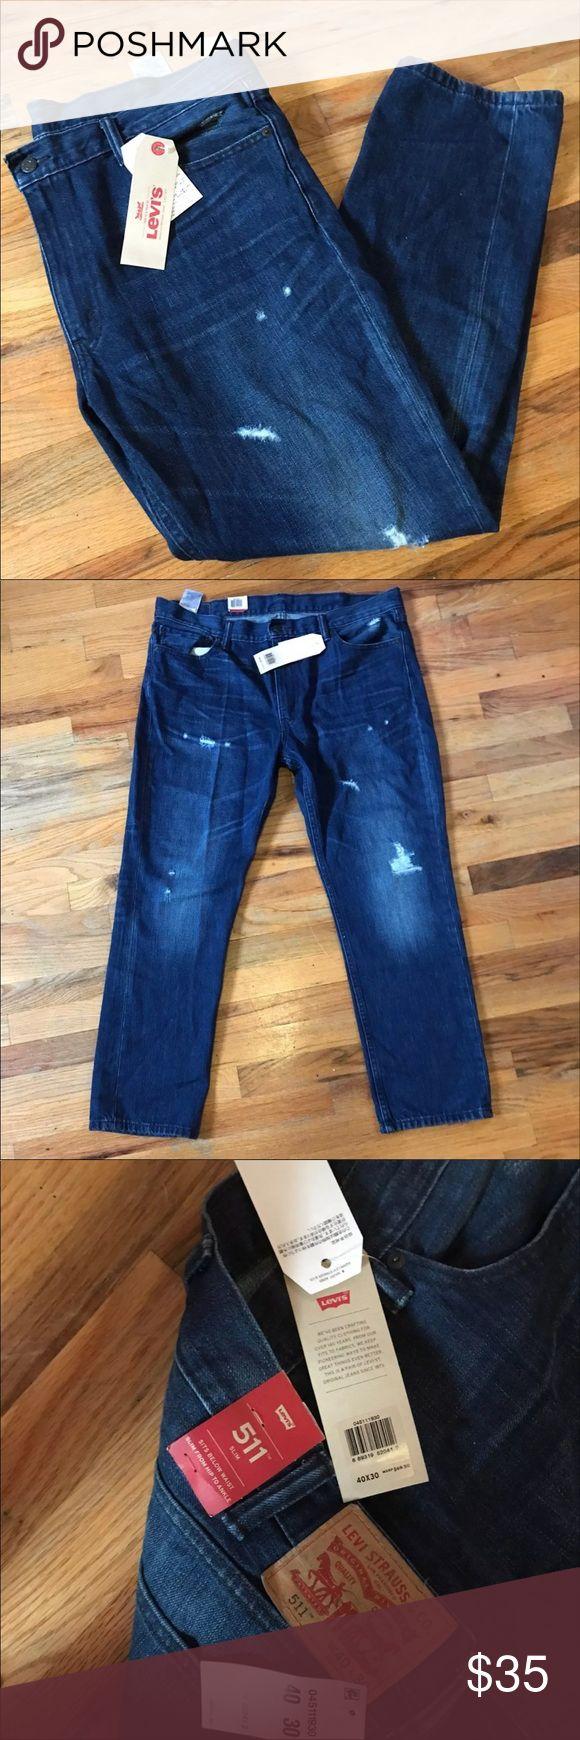 Levi's 511 Slim Jeana for Men Retail price $70. Sits below the waist. Slim fit. Brand new . 100% authentic Levi's Jeans Slim